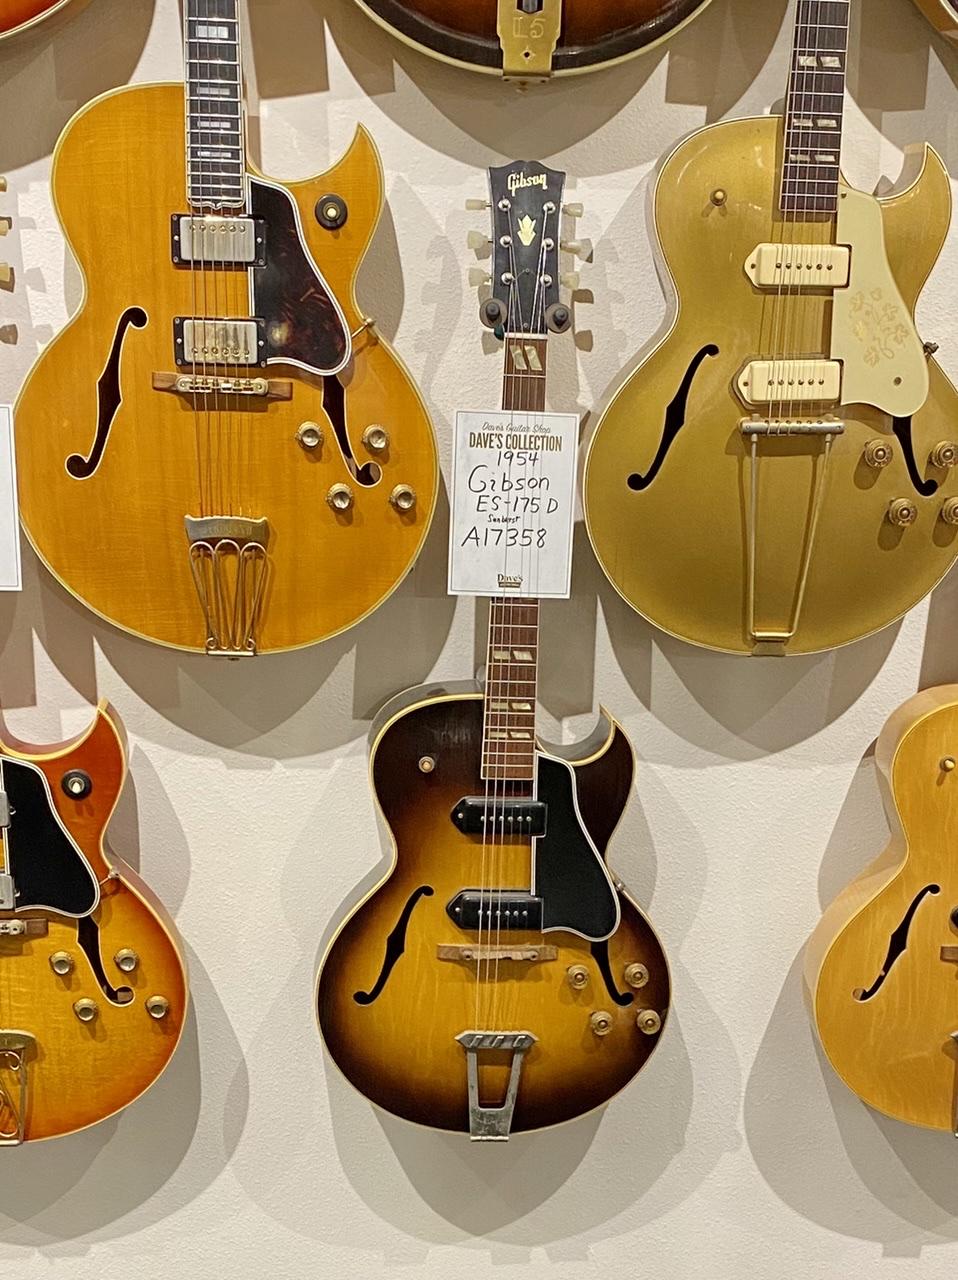 Visited the Mecca—Dave's Guitar Shop-823616c7-831a-492b-91fb-efffe26d9675-jpeg